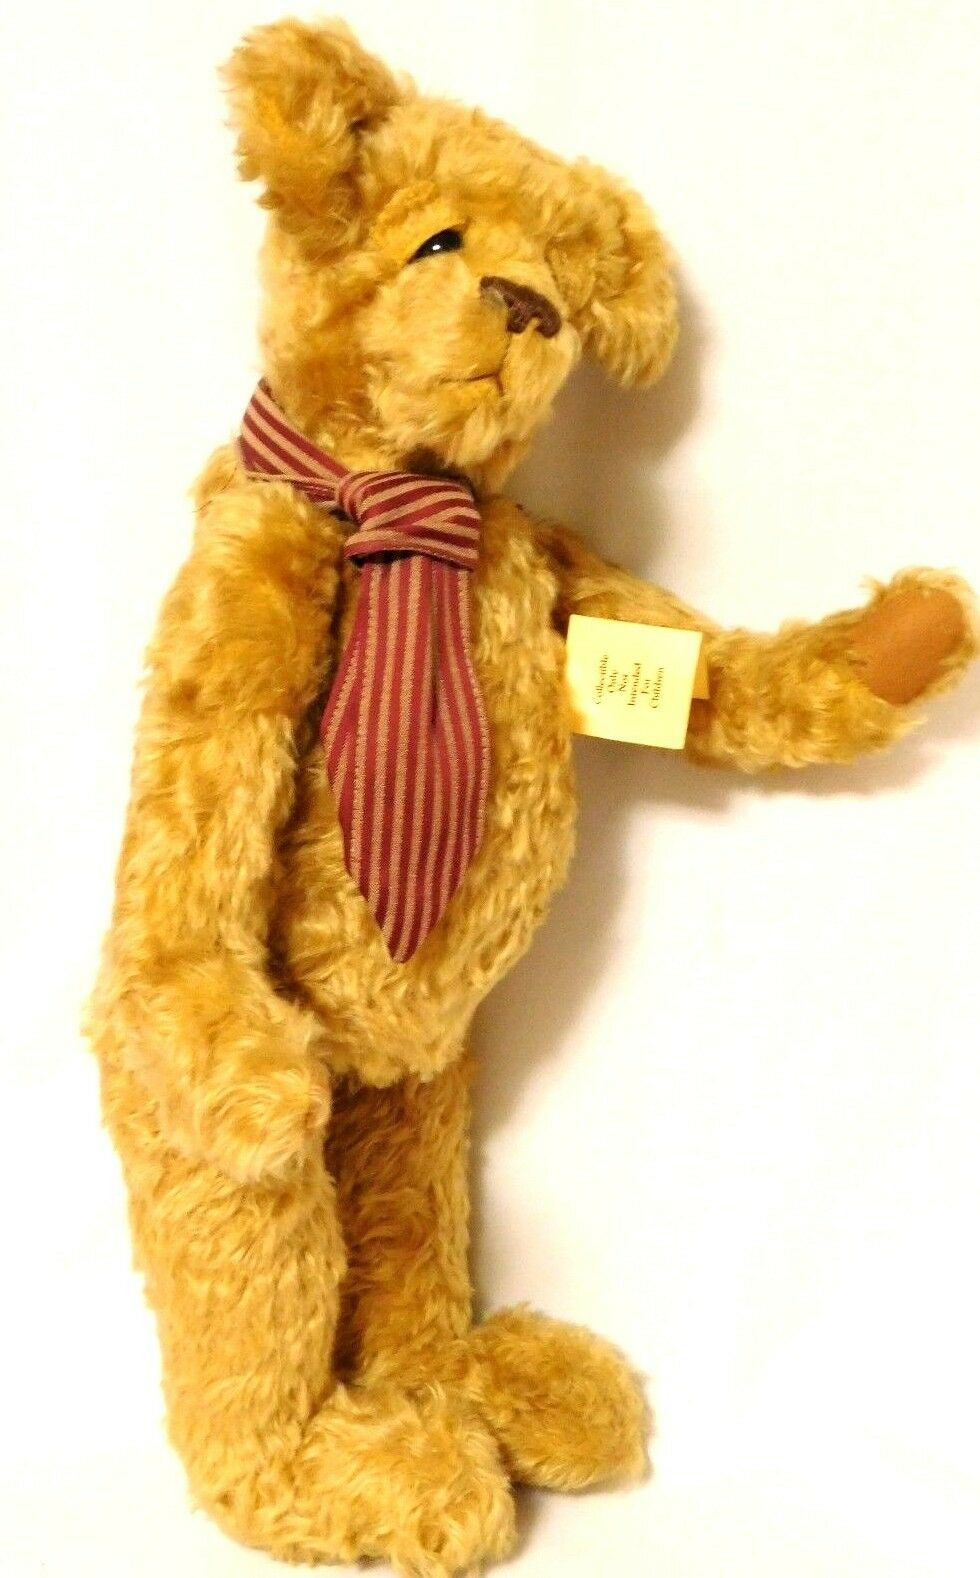 Rare Rare Rare  OLD TED  22  Teddy orso 1995 autobusSER orsoS  1 fatto & Signed Leeann Snyder e93578